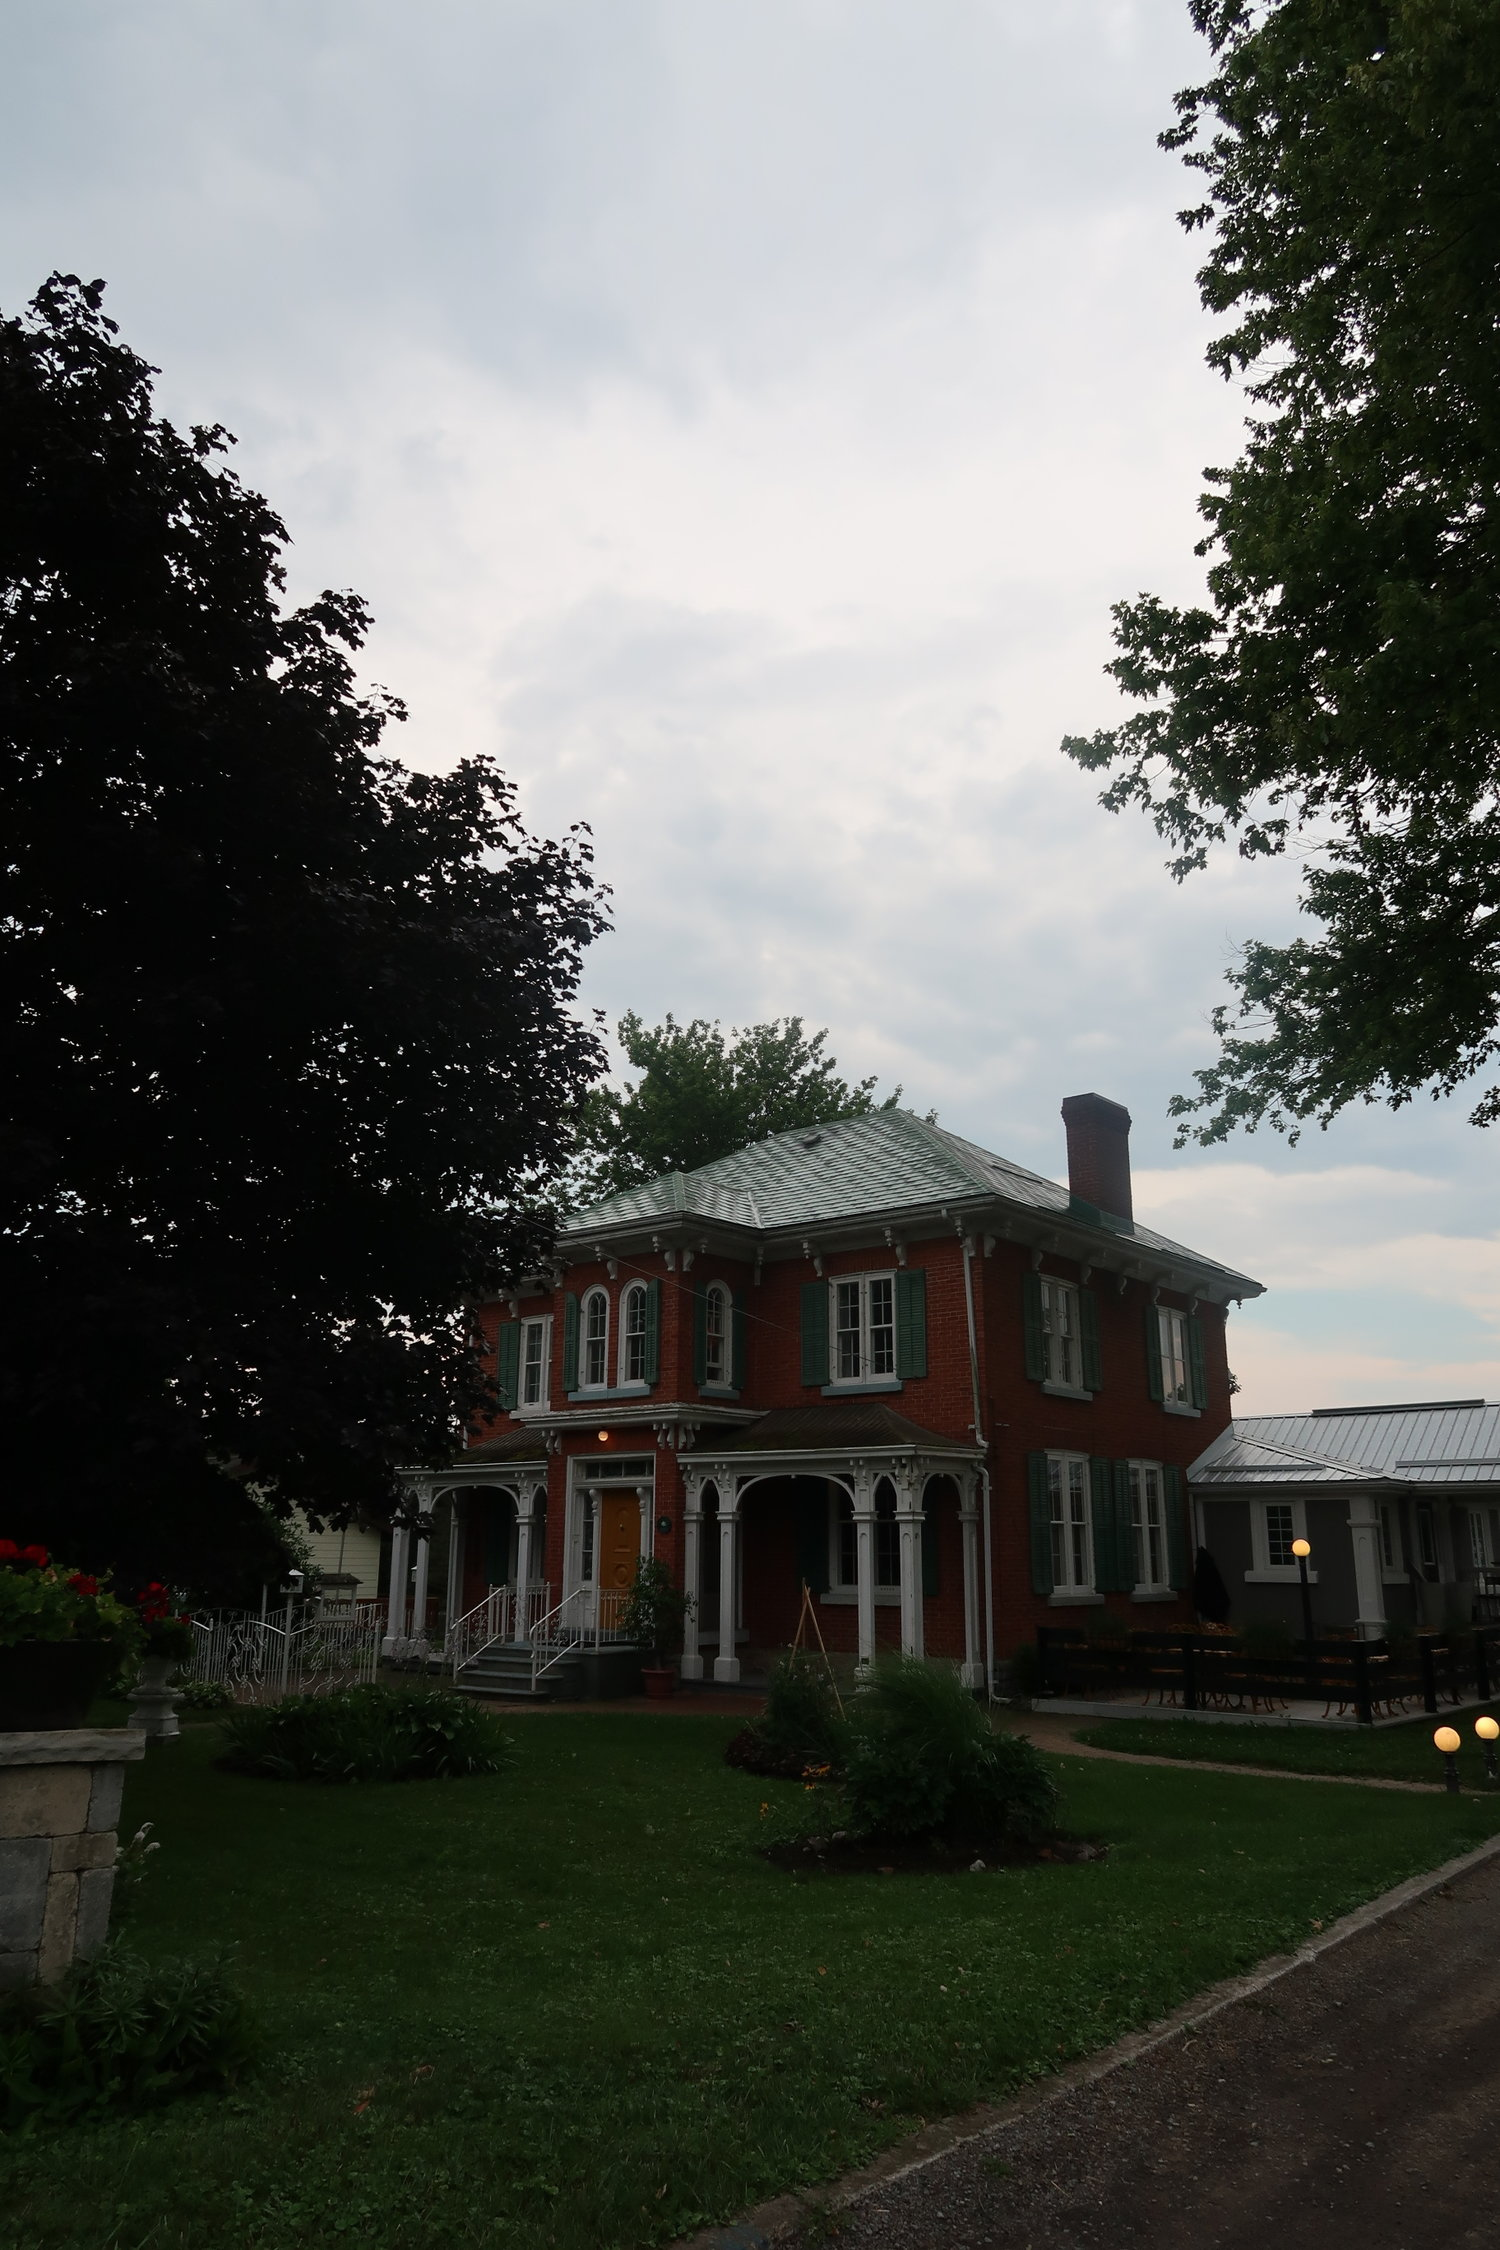 angeline's inn, prince edward county, seedlings